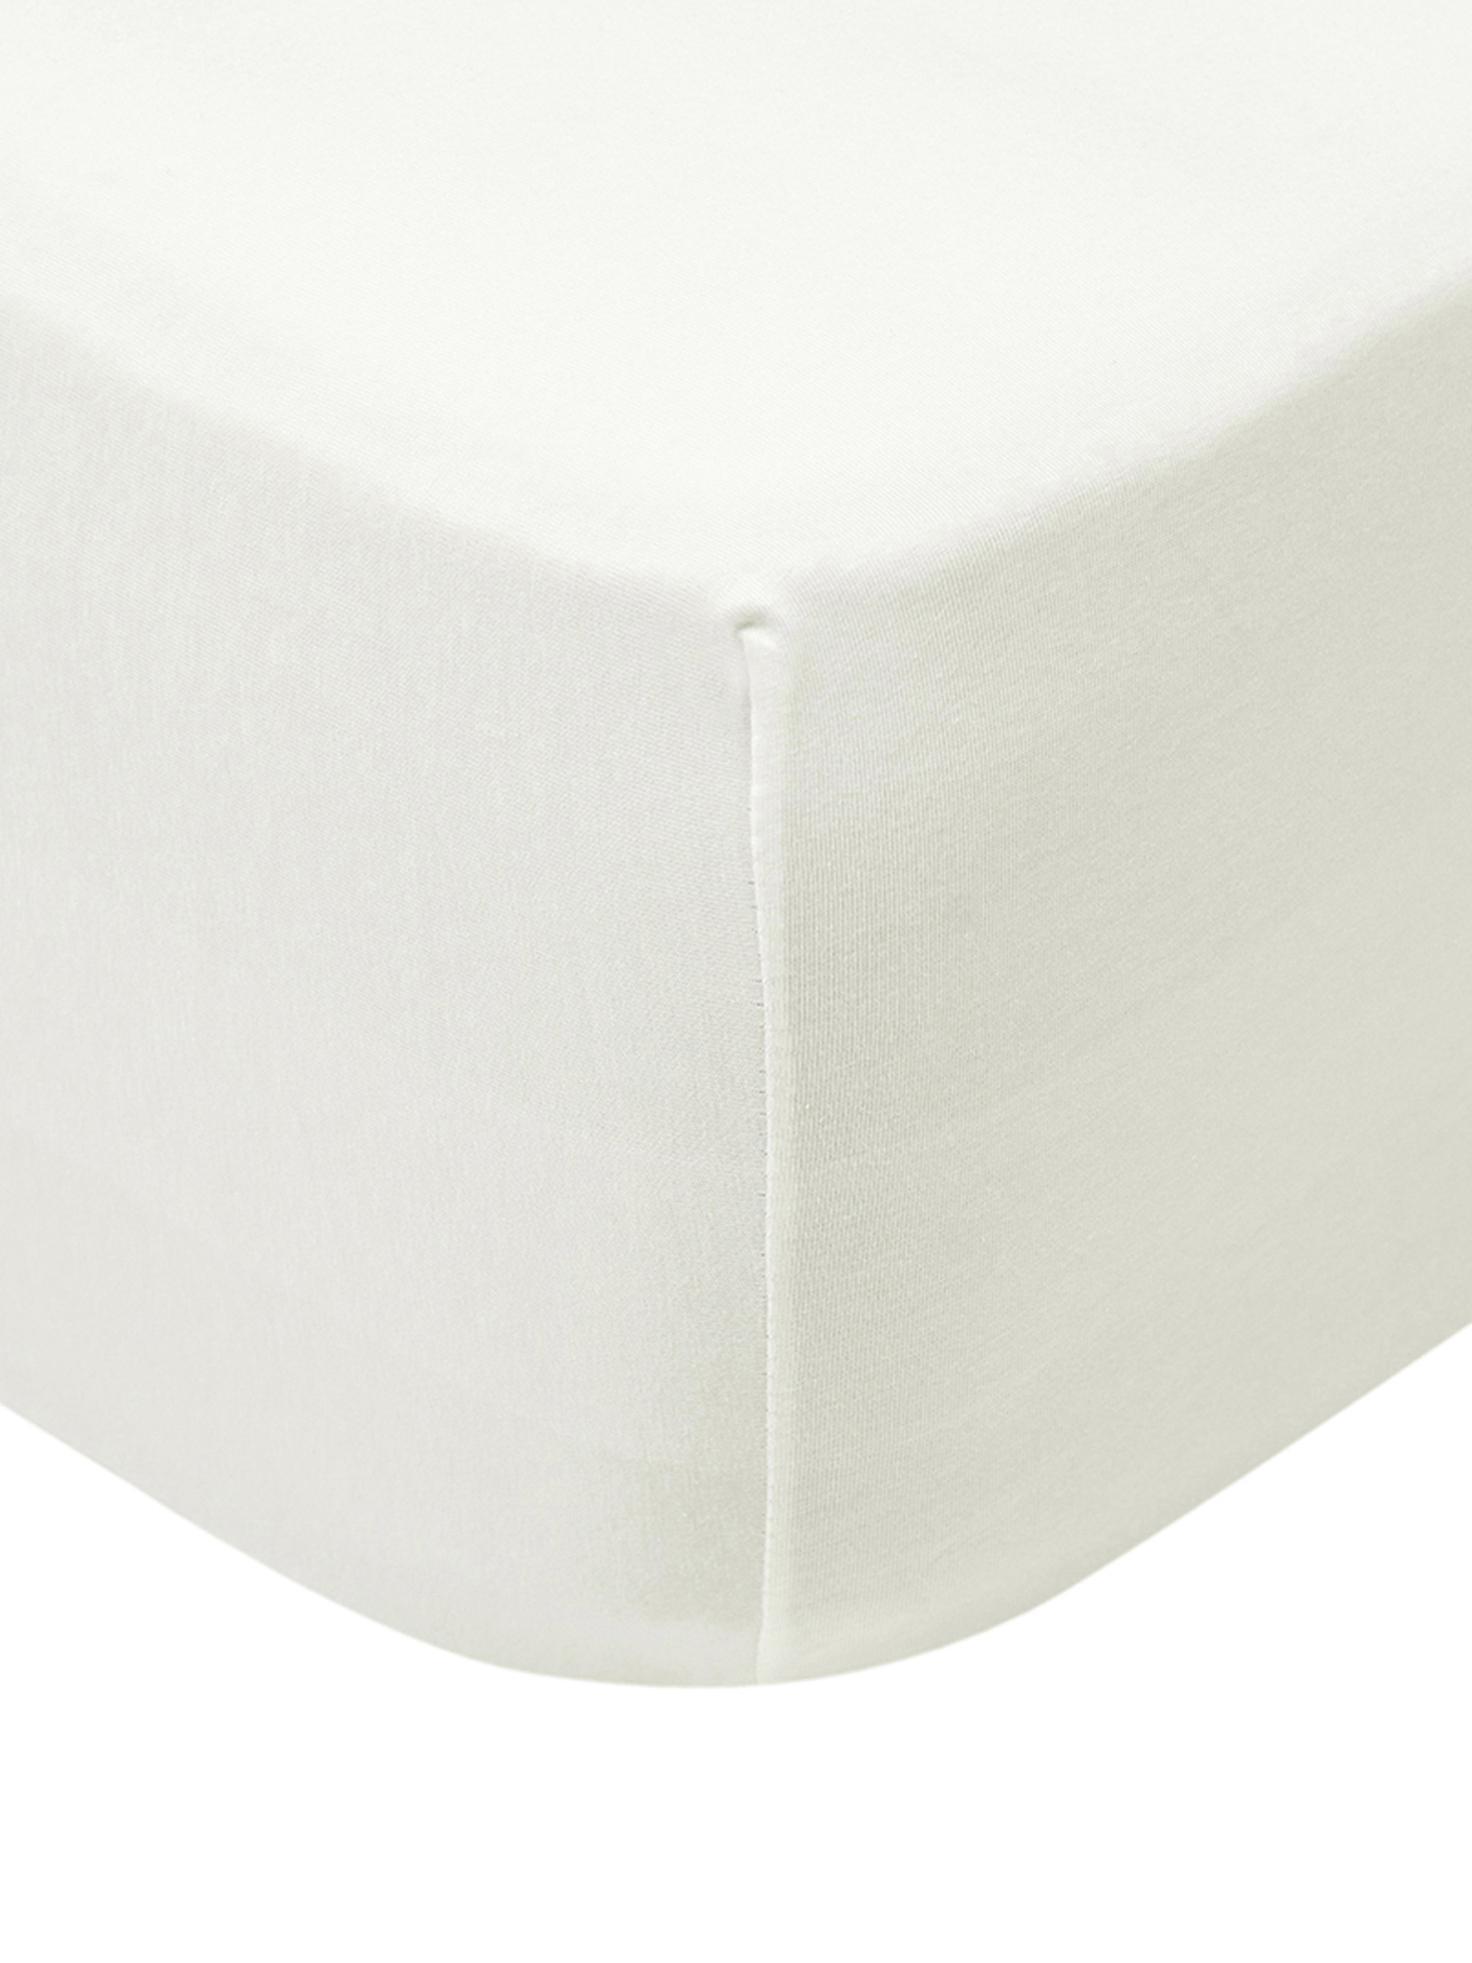 Lenzuolo con angoli in jersey-elastan Lara, 95% cotone, 5% spandex, Color crema, Larg. 90-100 x Lung. 200 cm